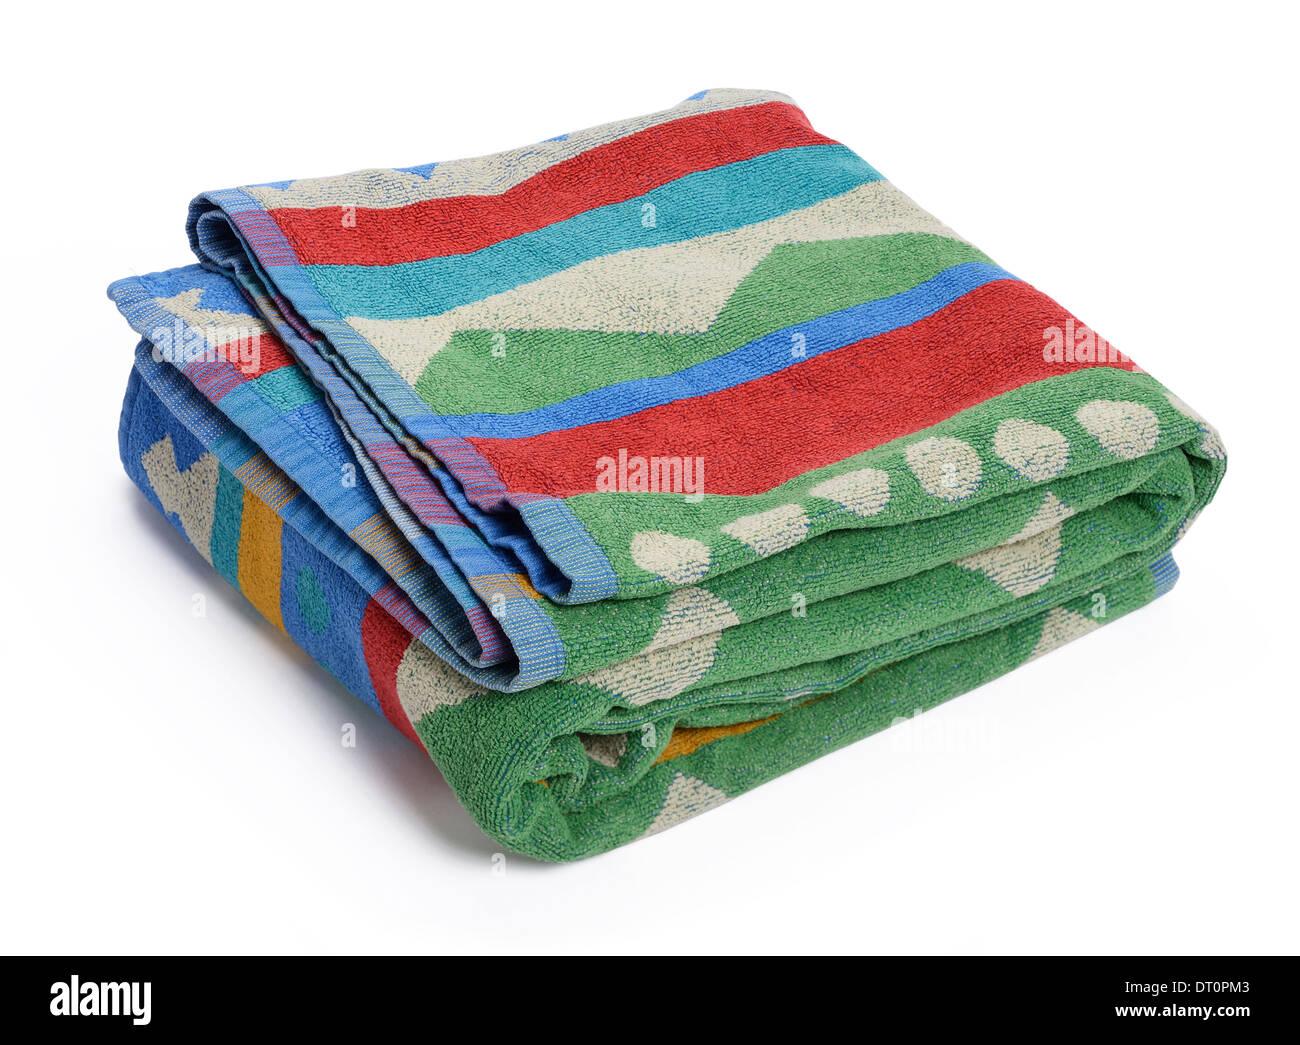 Colourful beach towel - Stock Image